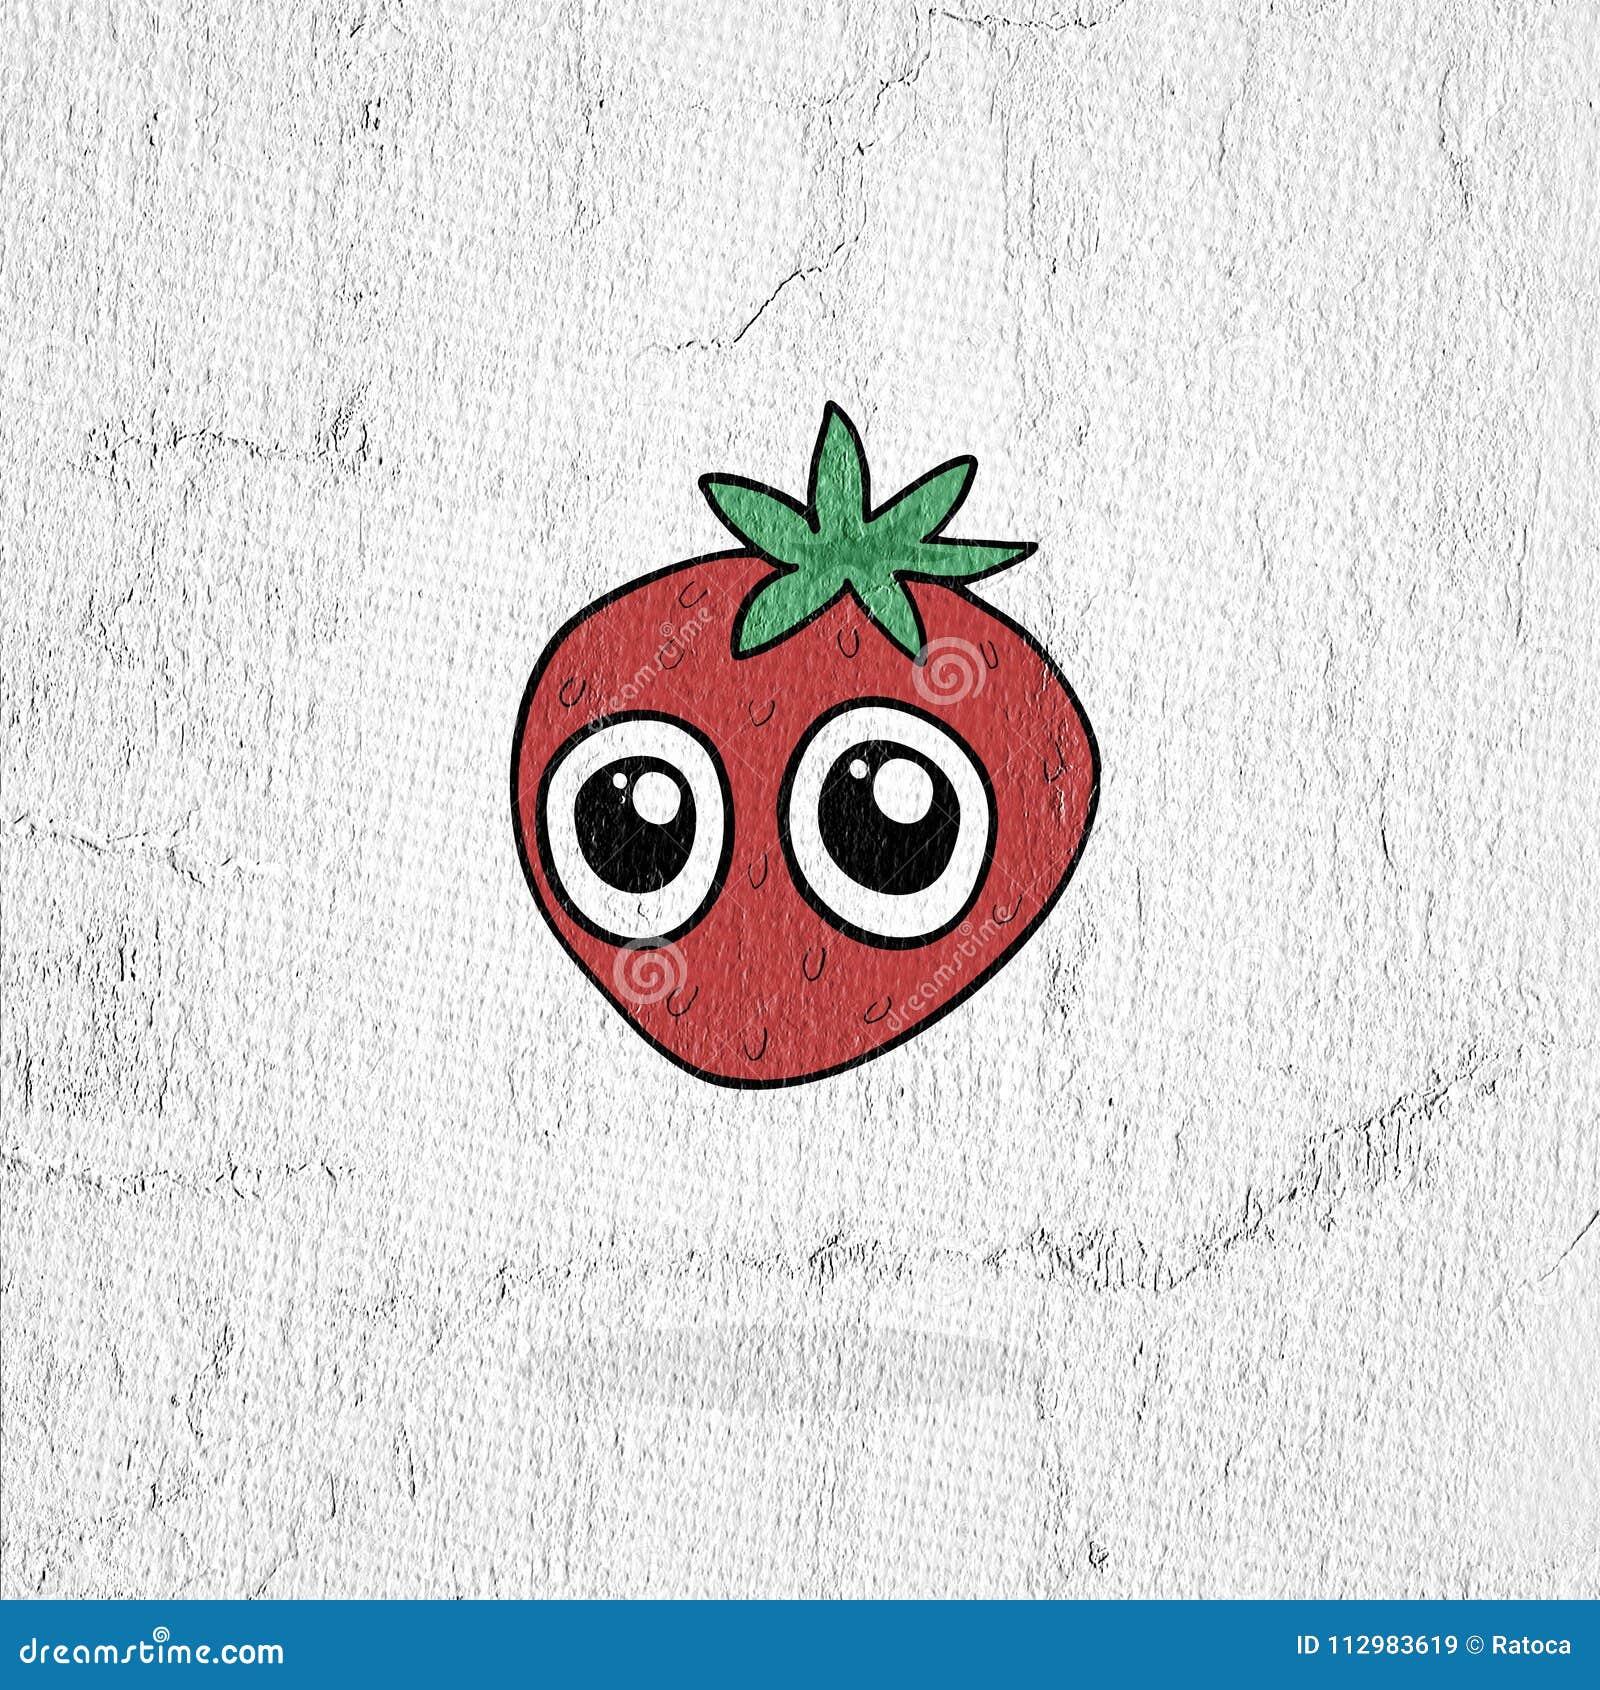 funny strawberry illustration